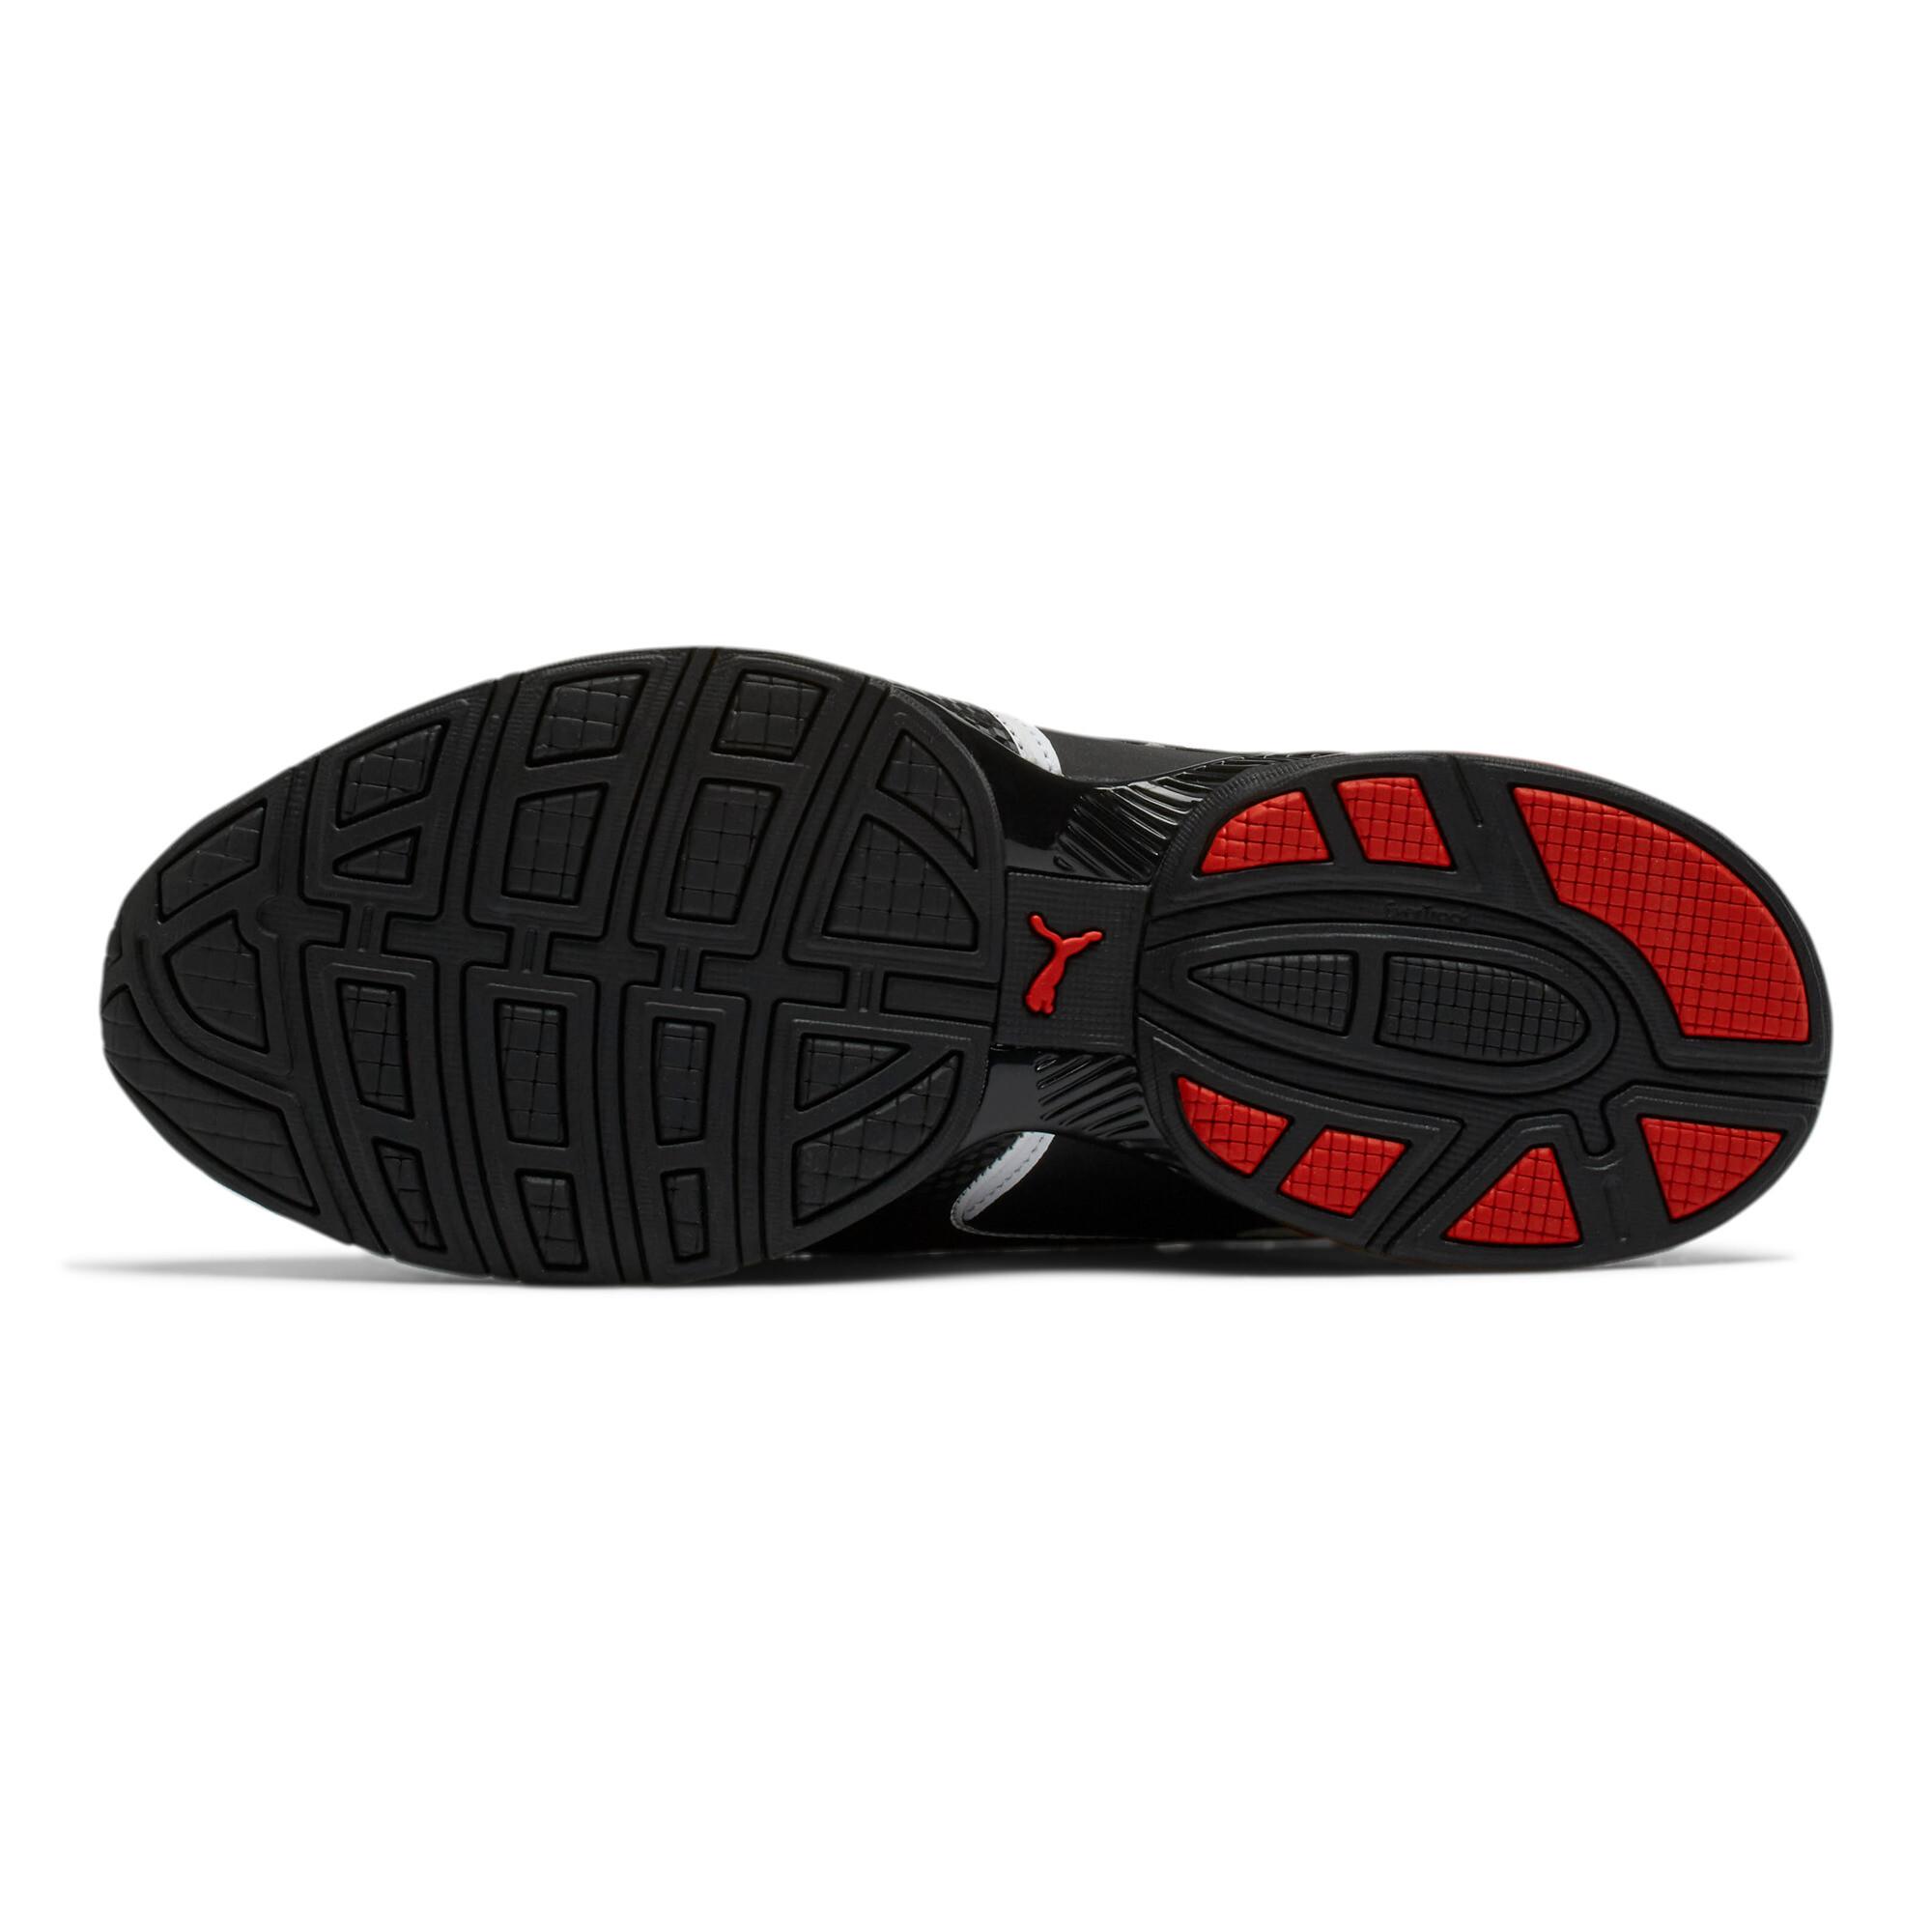 PUMA-Cell-Surin-2-Wide-Men-s-Training-Shoes-Men-Shoe-Running thumbnail 5